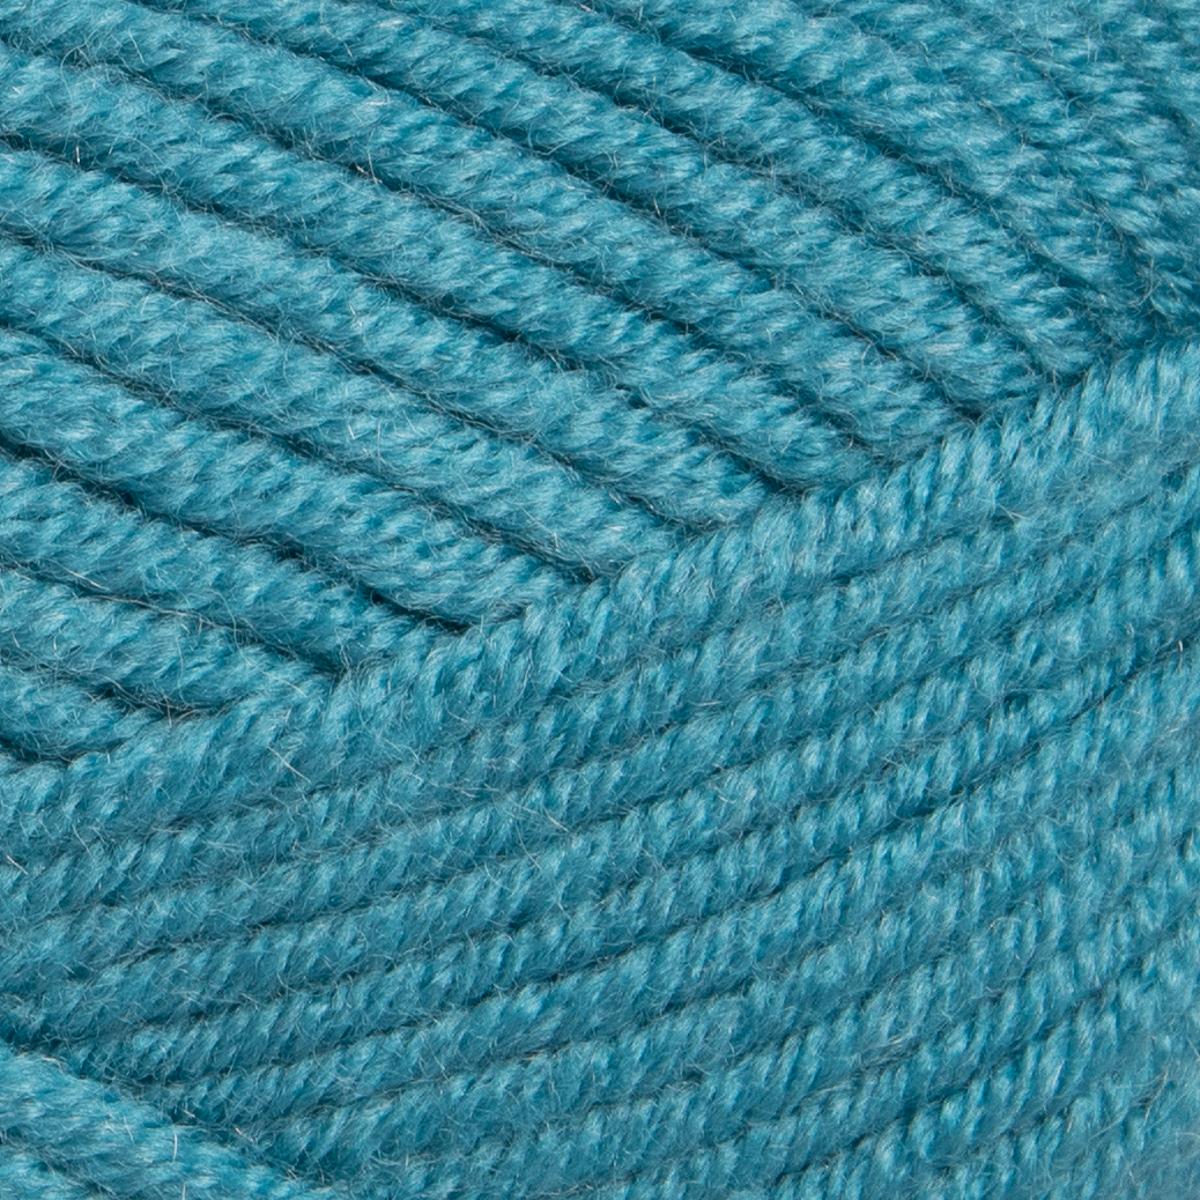 3pk-Lion-Brand-Woolspun-Acrylic-amp-Wool-Yarn-Bulky-5-Knit-Crocheting-Skeins-Soft thumbnail 15